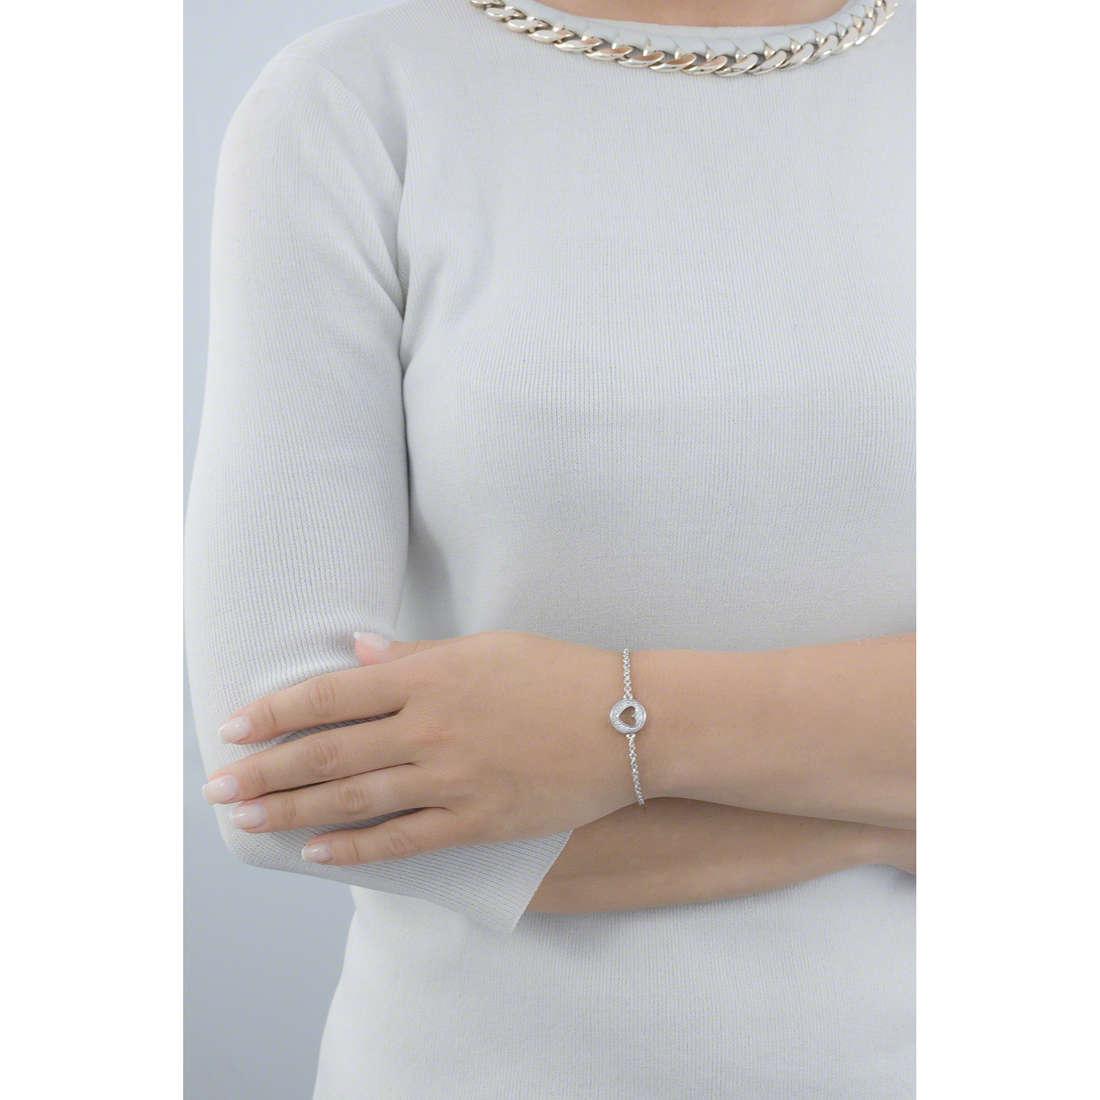 Guess bracciali G Girl donna UBB51495 indosso